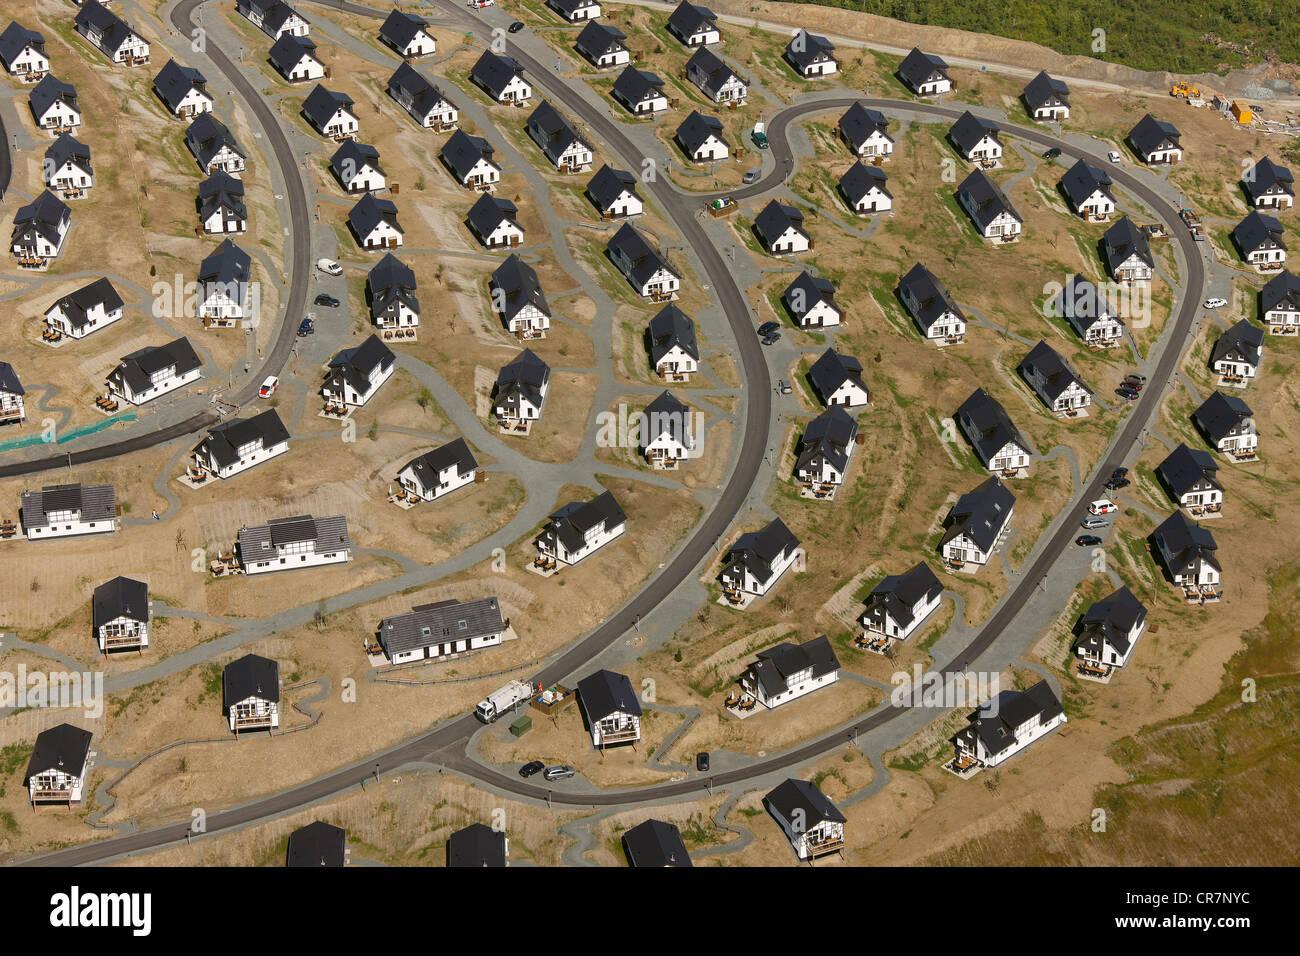 Aerial view, Suerenberg building site, holiday accommodation, recreation area, Winterberg, Sauerland, North Rhine - Stock Image